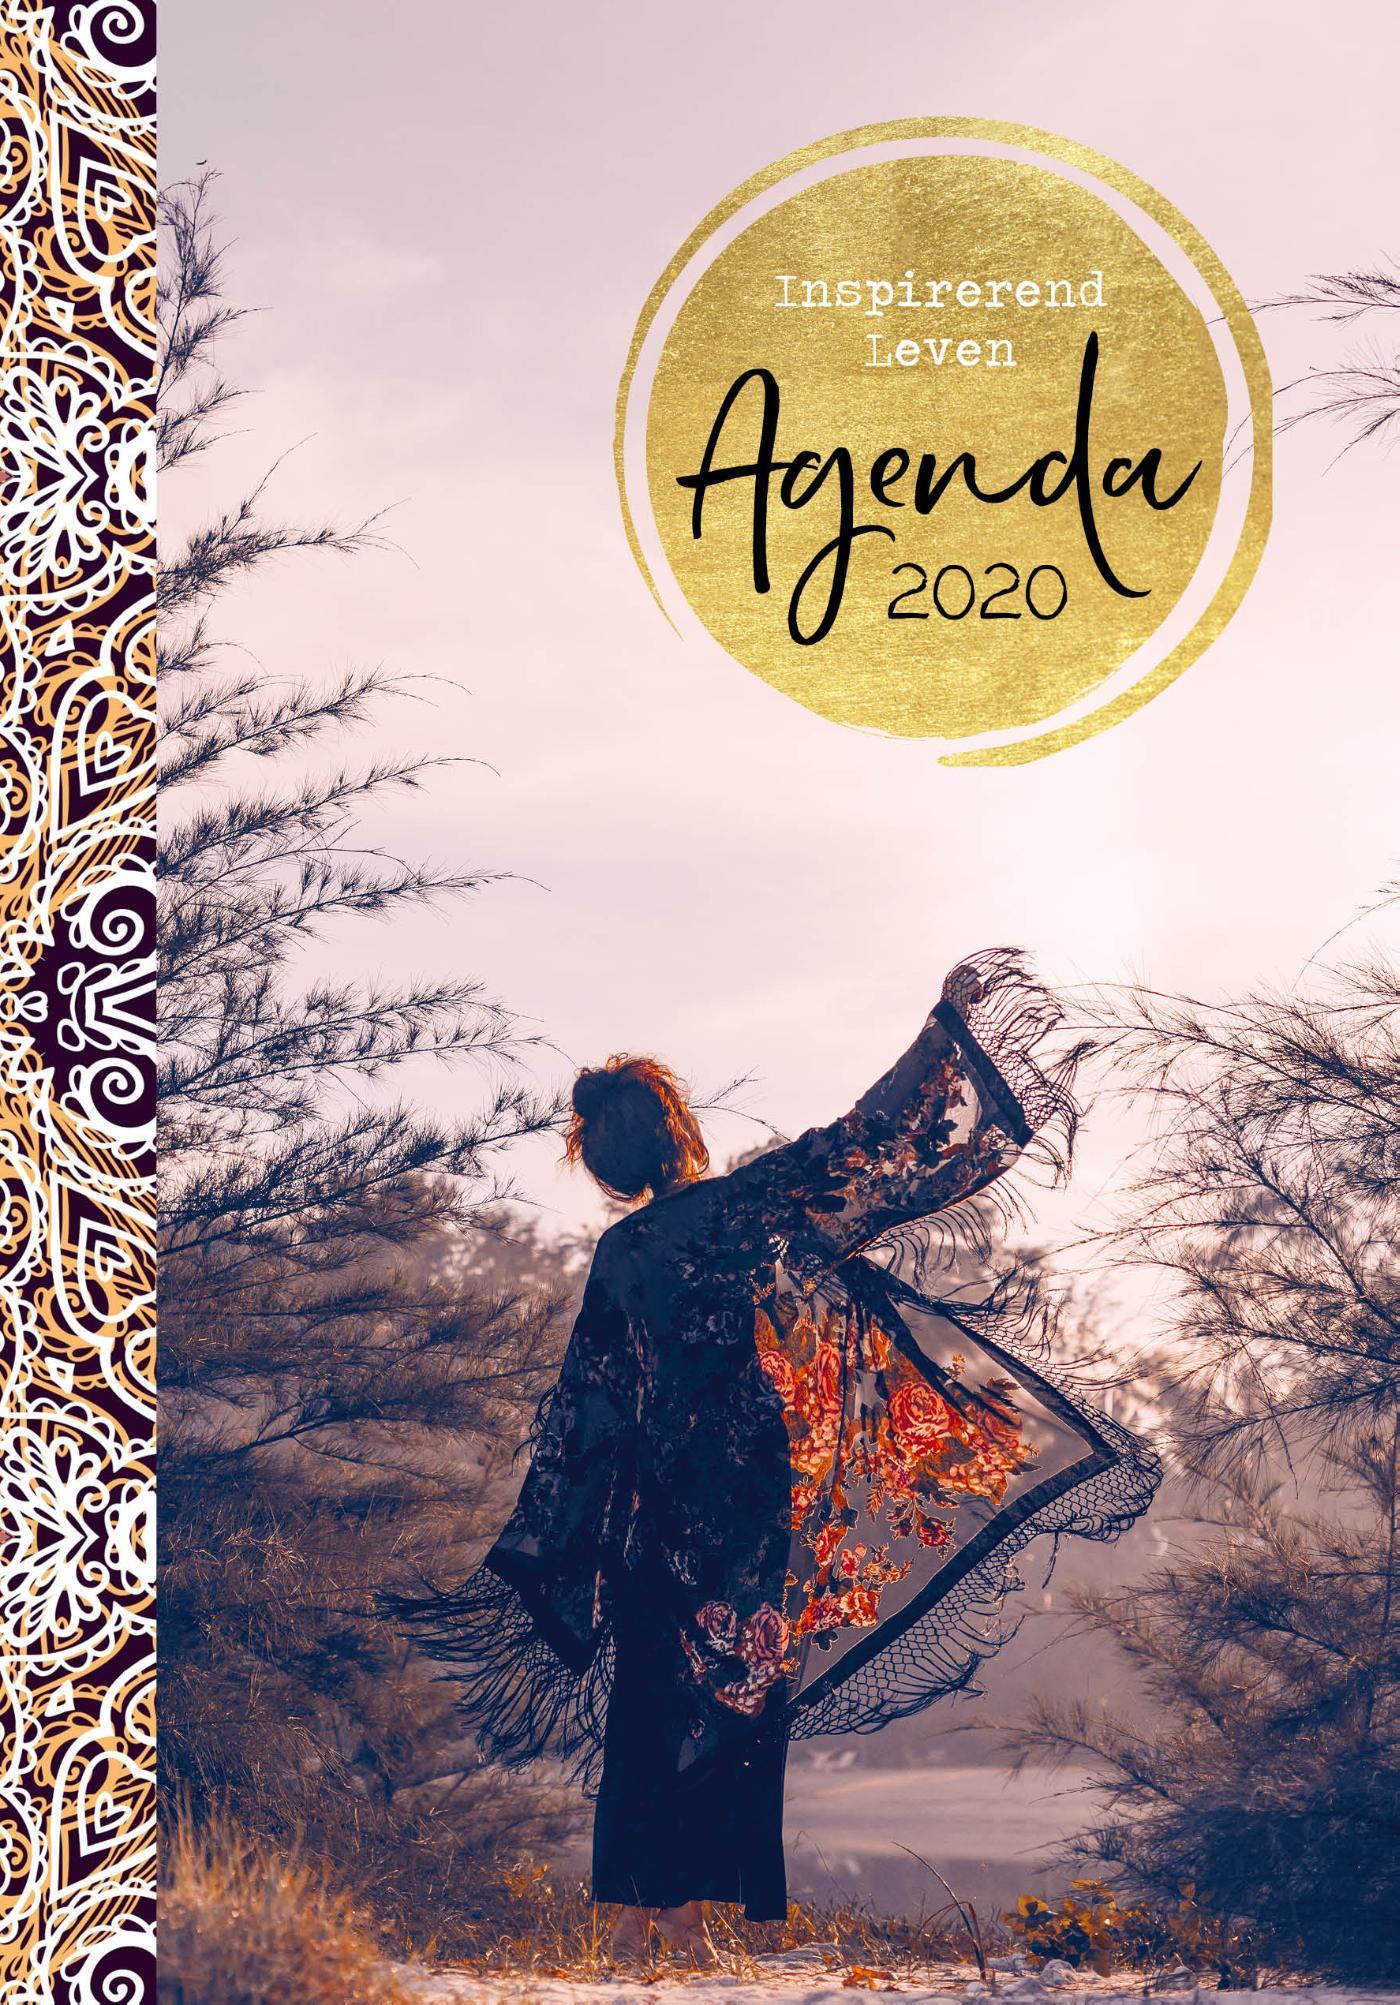 Inspirerend Leven Agenda 2020